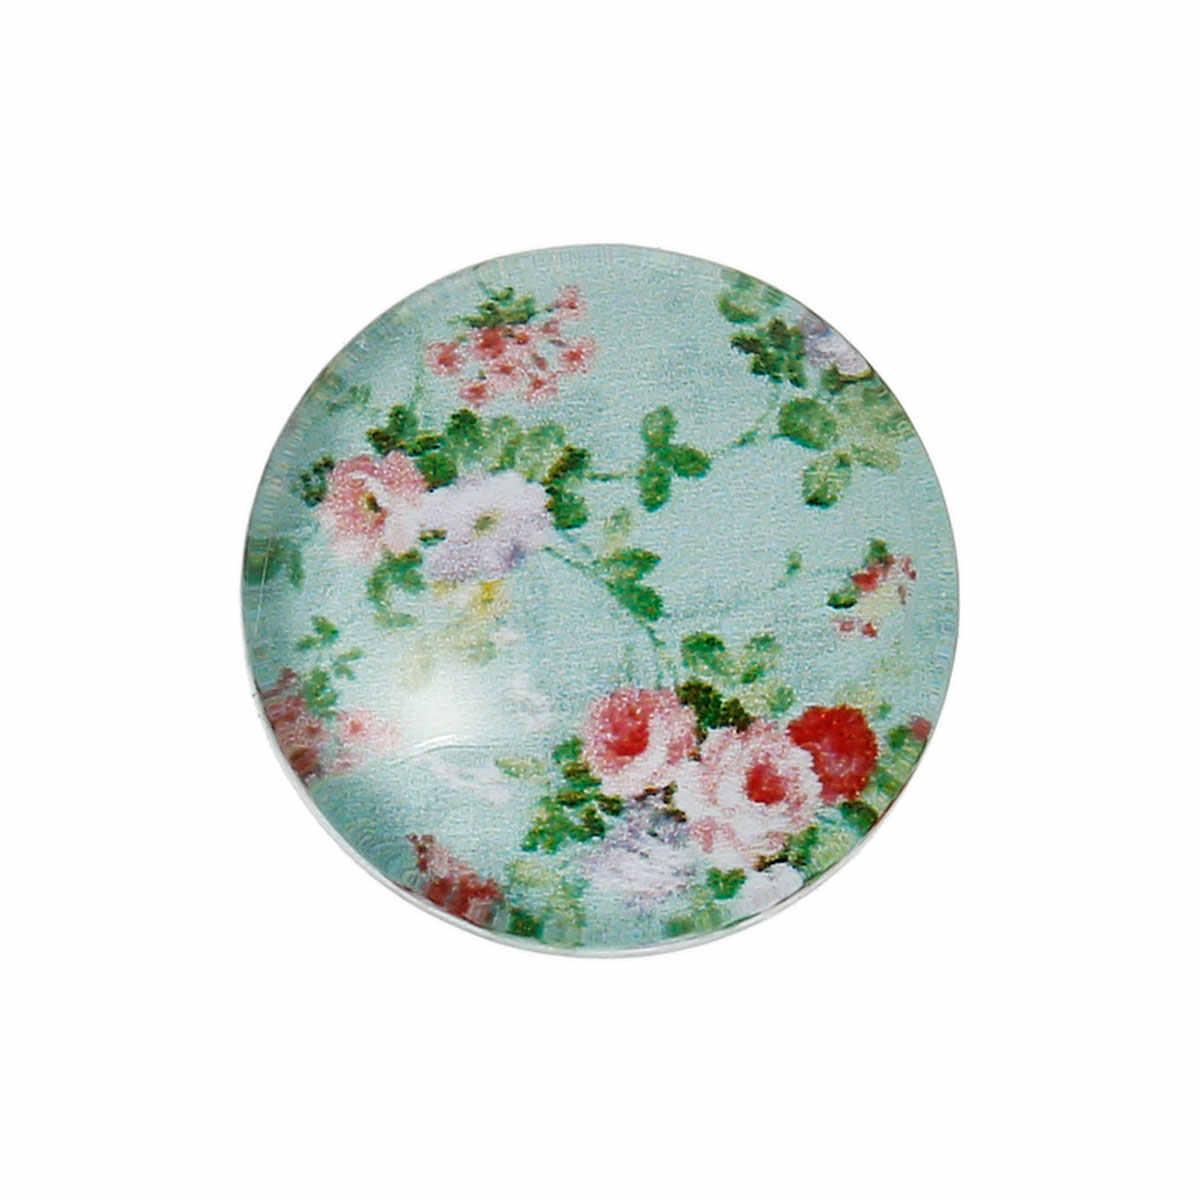 "DoreenBeads זכוכית כיפת אטמי Cabochons קישוטים ממצאי עגול Flatback כתום פרח דפוס 12mm (4/8 "") Dia, 2 חתיכות"